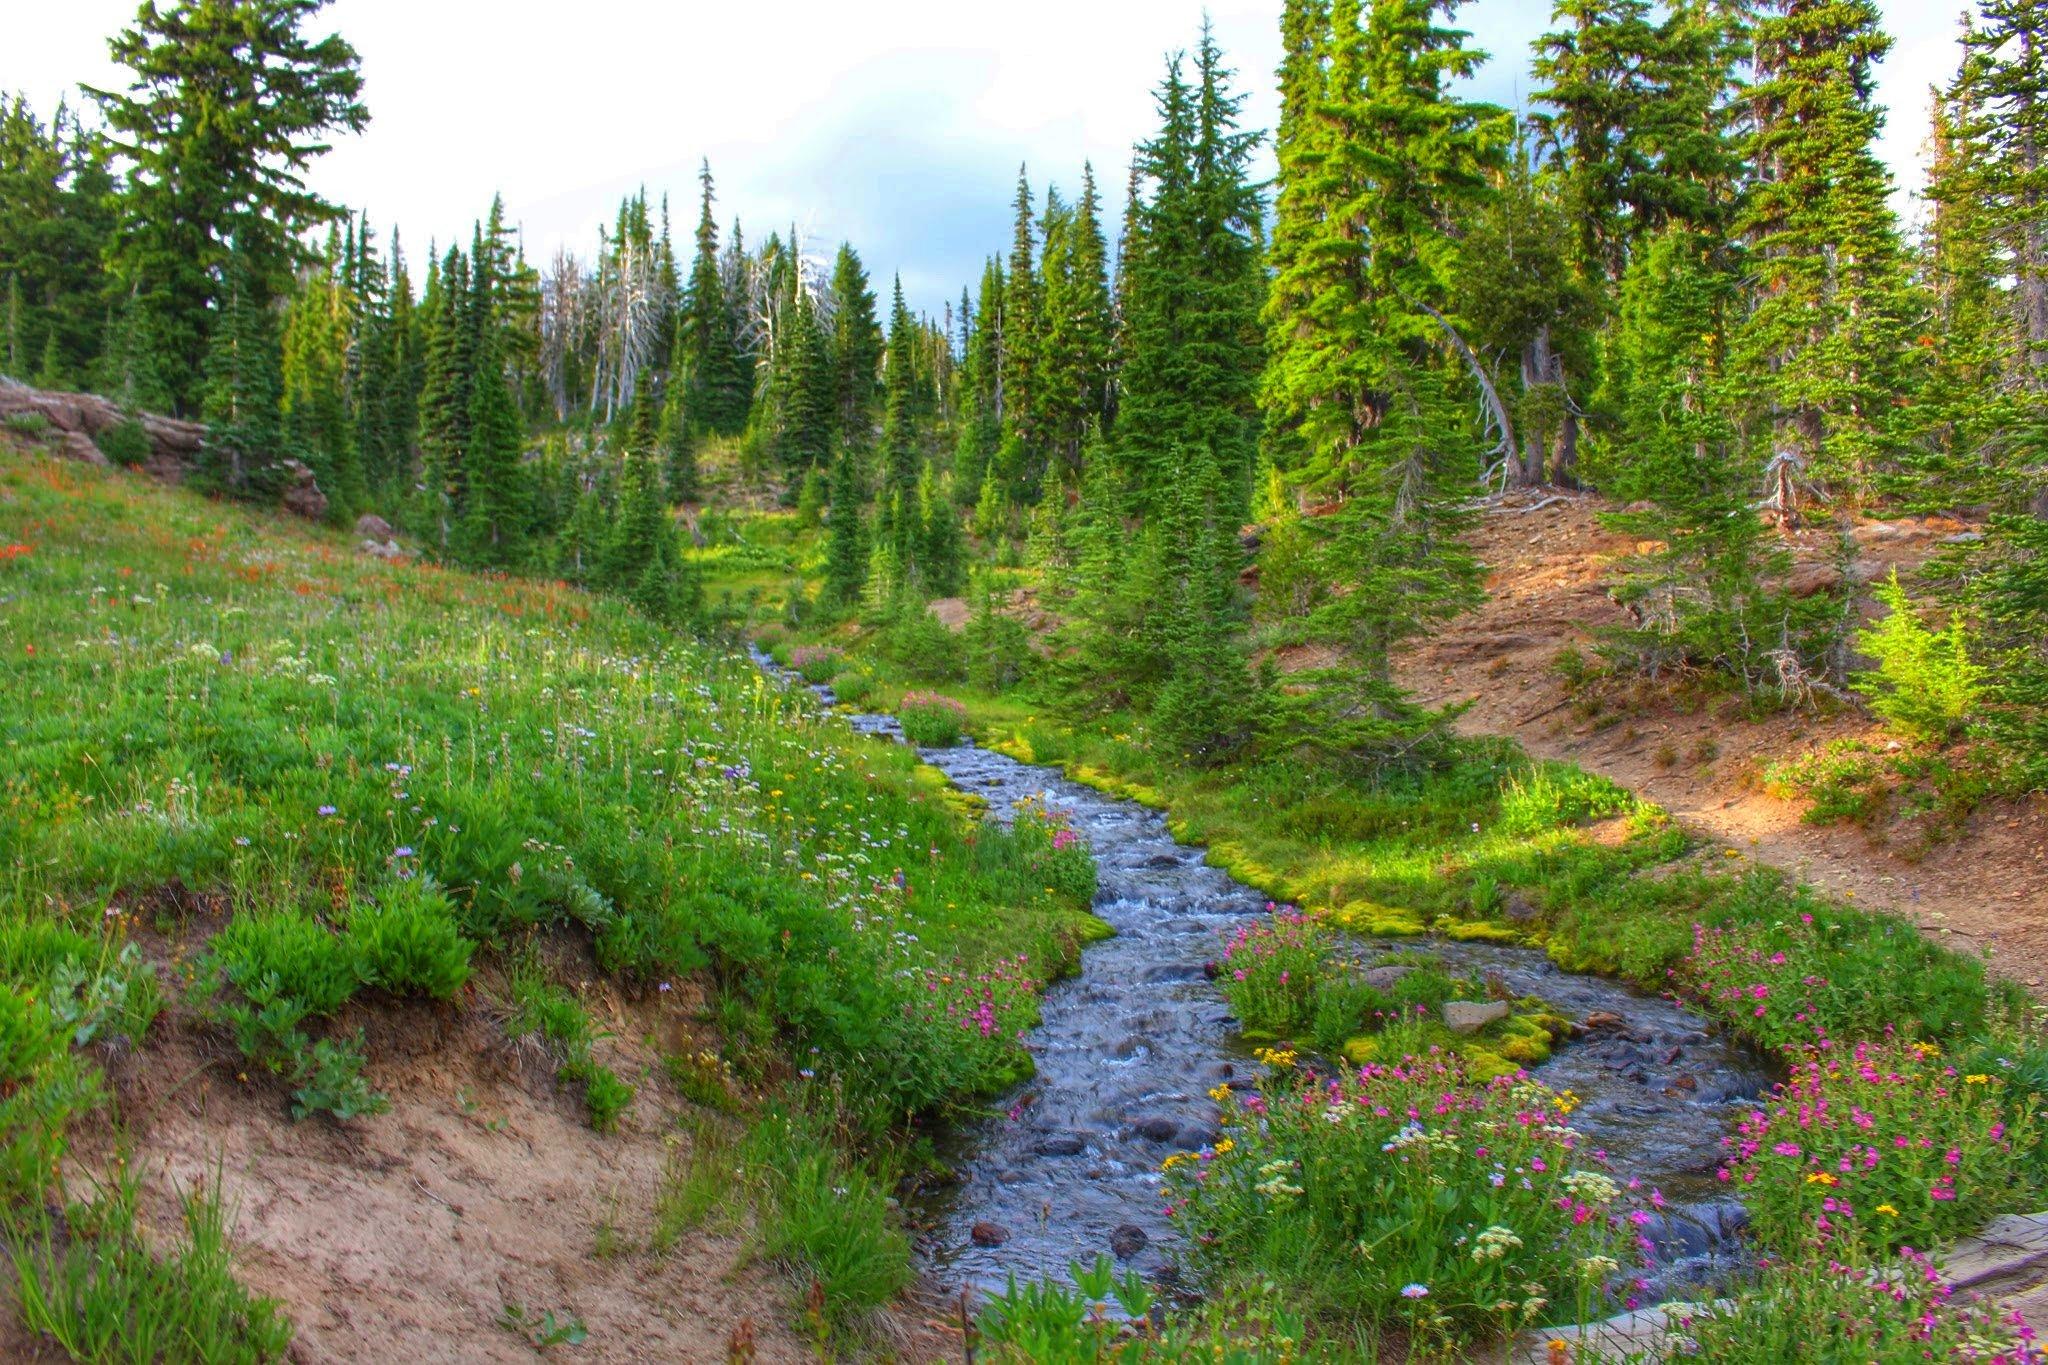 Hiking the Incredibly Beautiful Bird Creek Meadows (Mt. Adams, Washington)